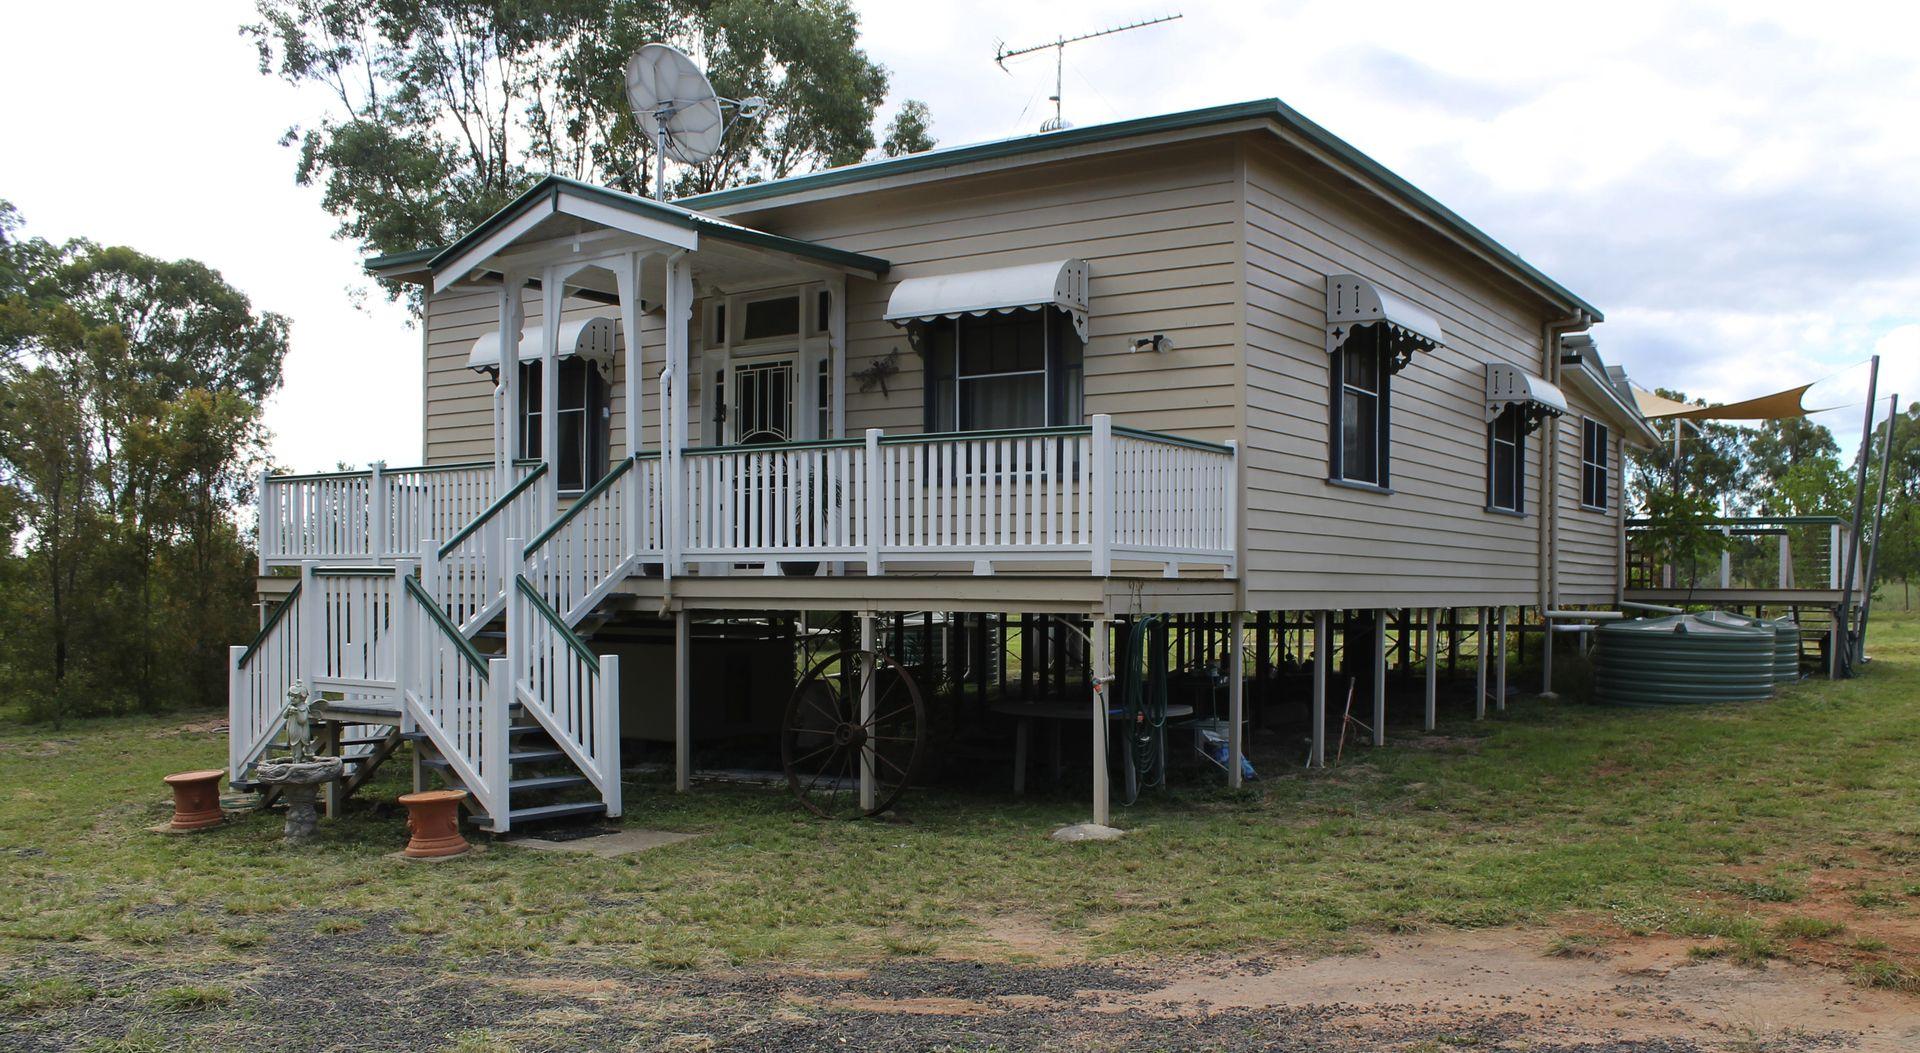 181 Greenup-Limevale Rd, Coolmunda QLD 4387, Image 0